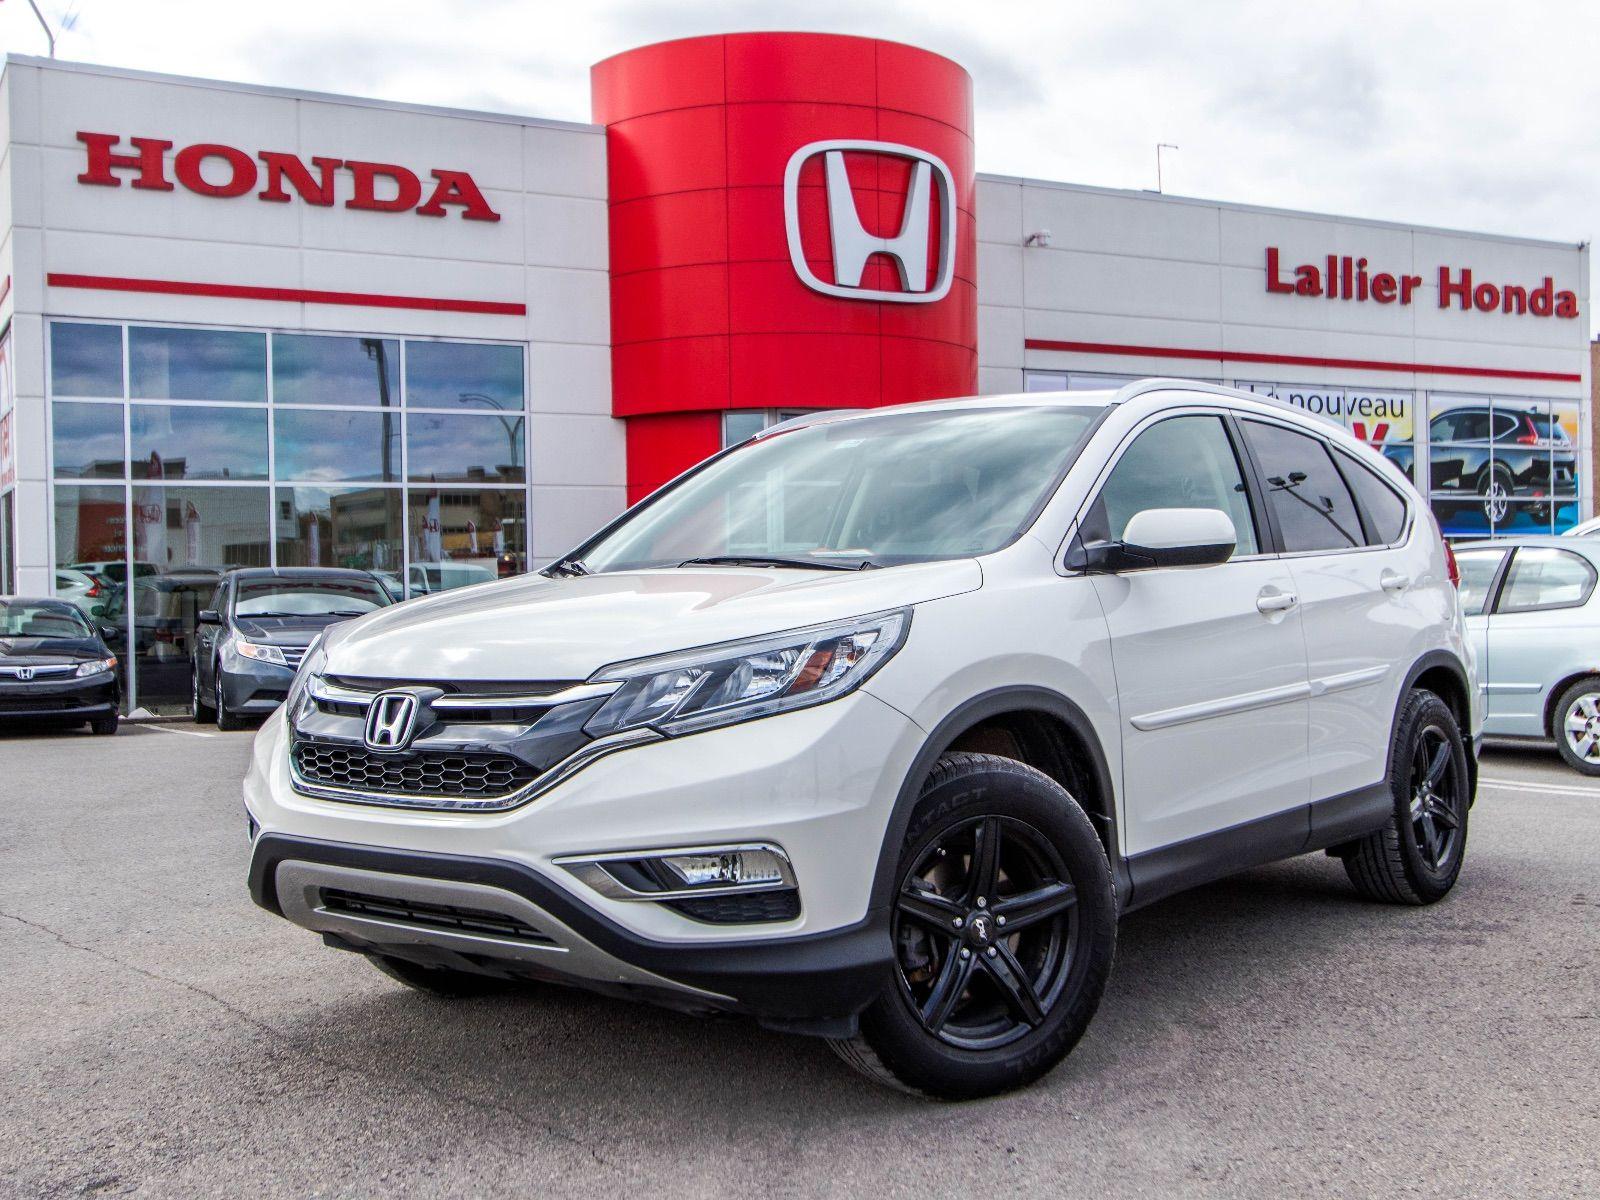 Pre owned 2015 honda cr v ex l lallier honda montreal in for Honda used inventory